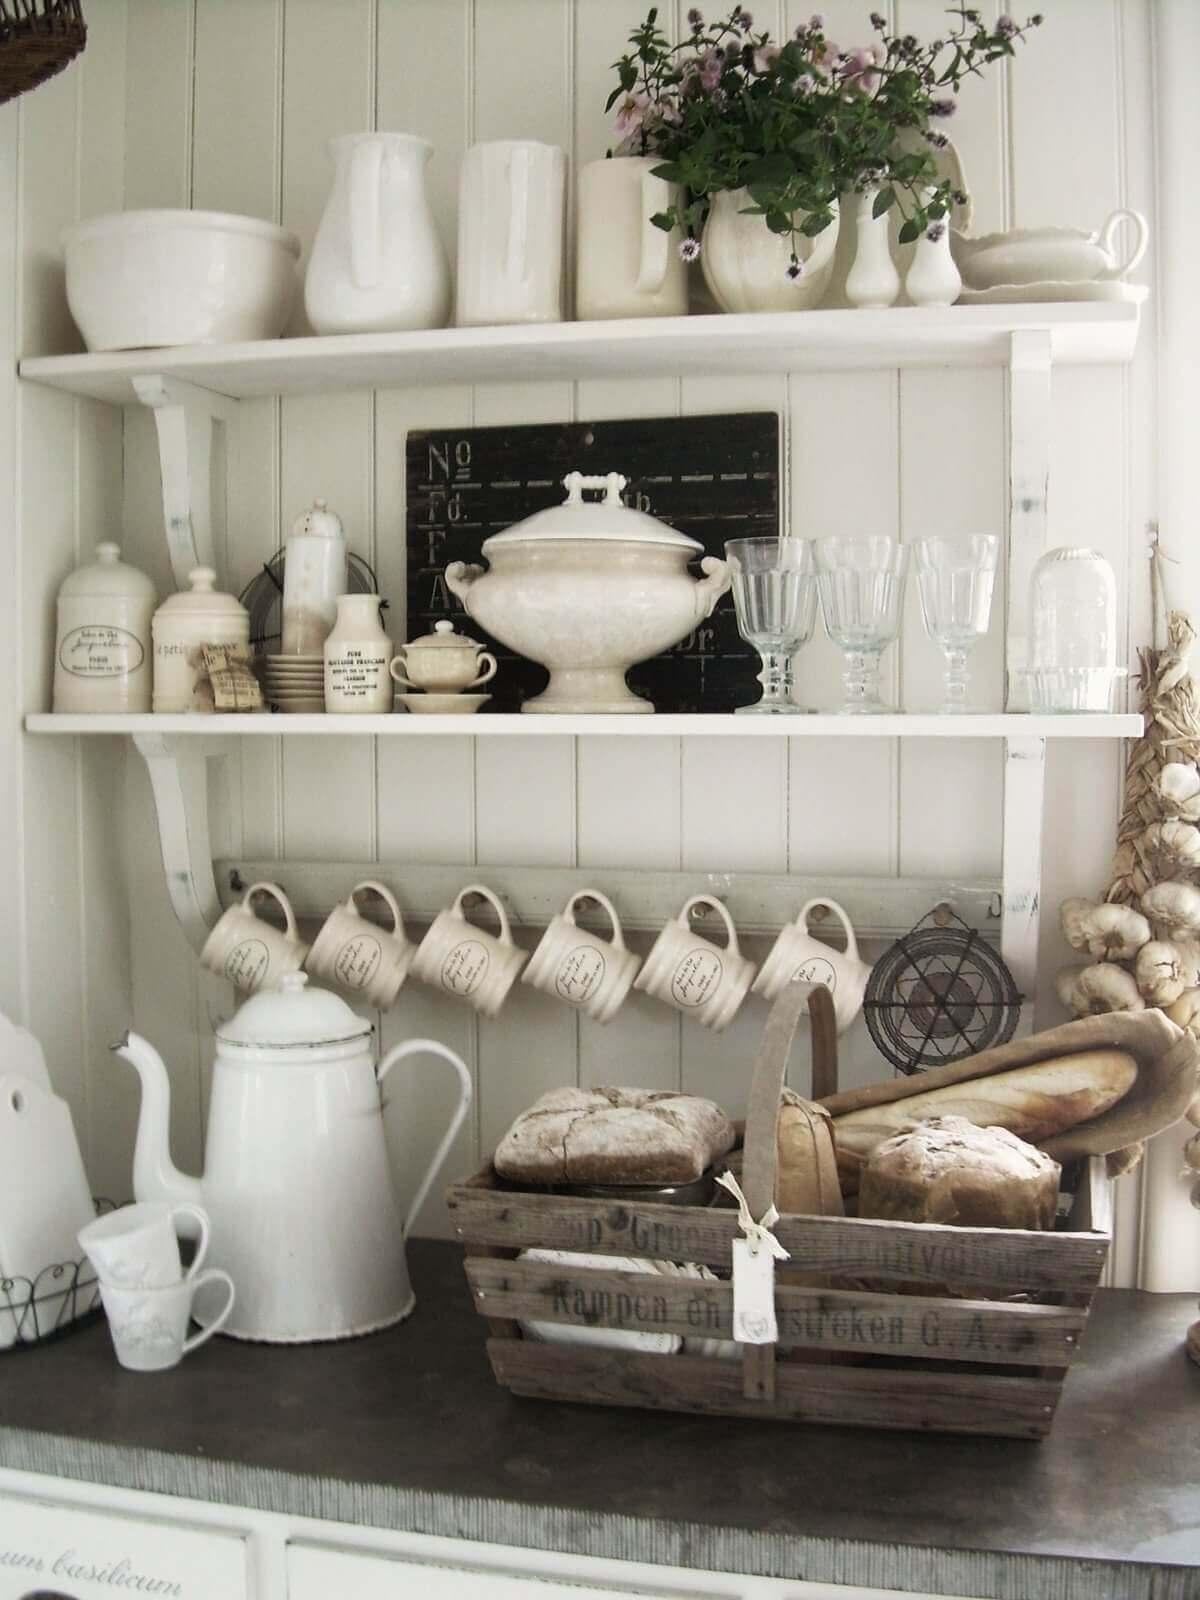 02 Vintage Kitchen Design Decor Ideas Homebnc Rina Watt Blogger Home Diy And Recipes